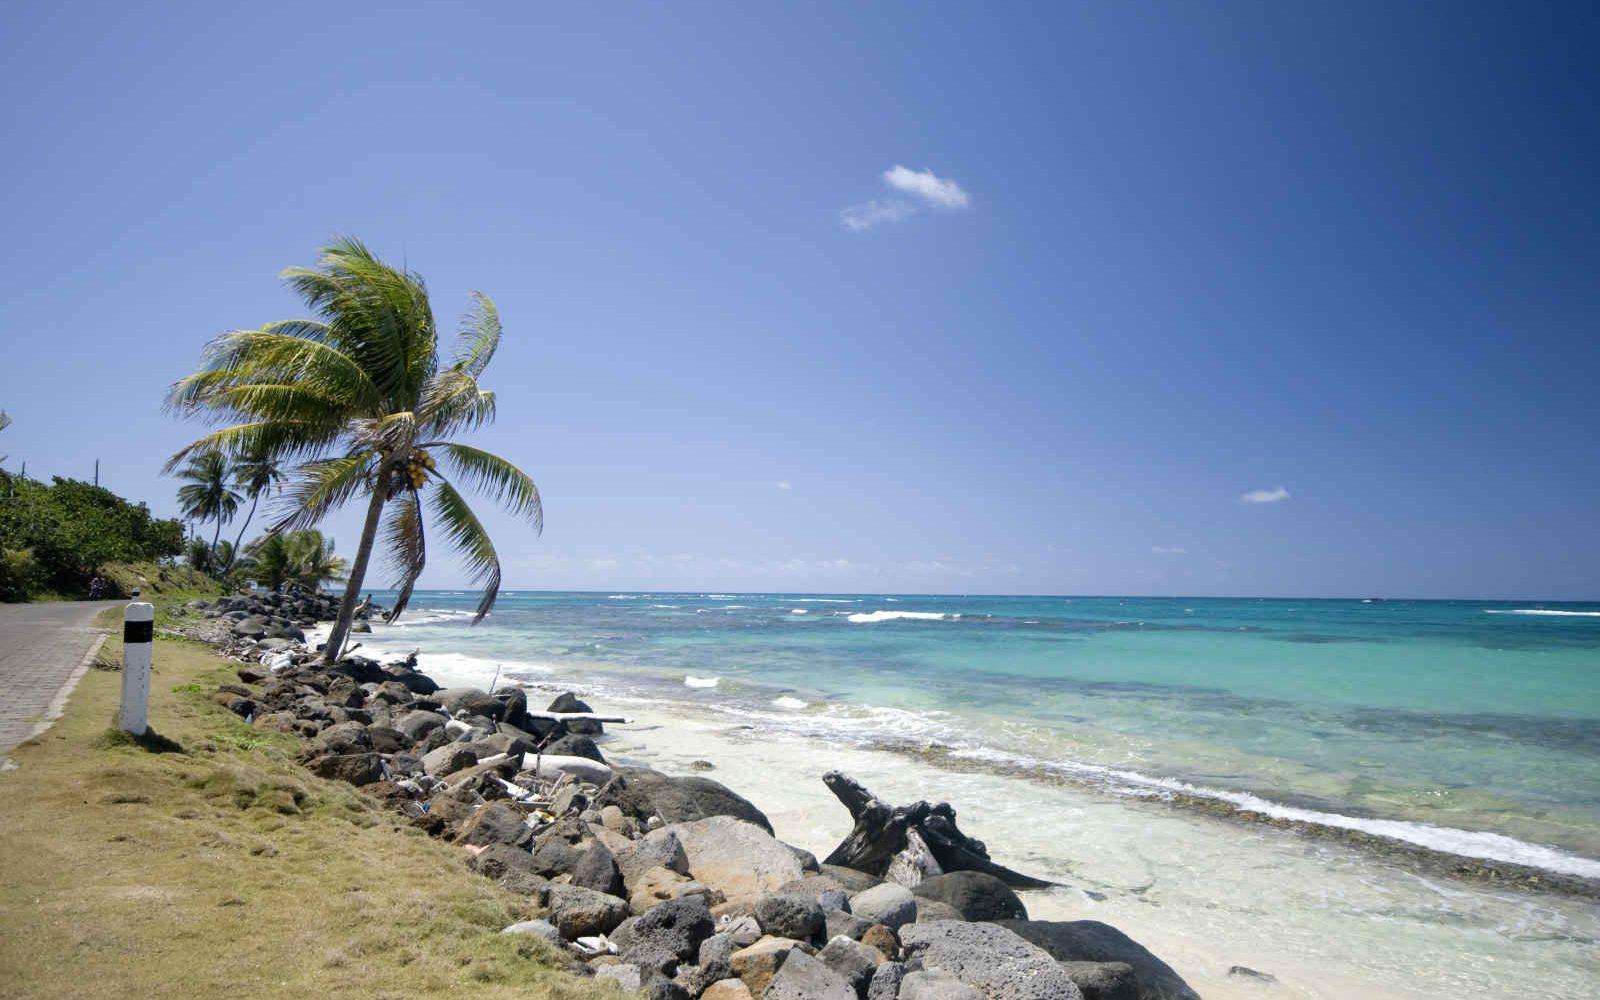 Road Sallie Peachie Beach, Corn Island , Nicaragua